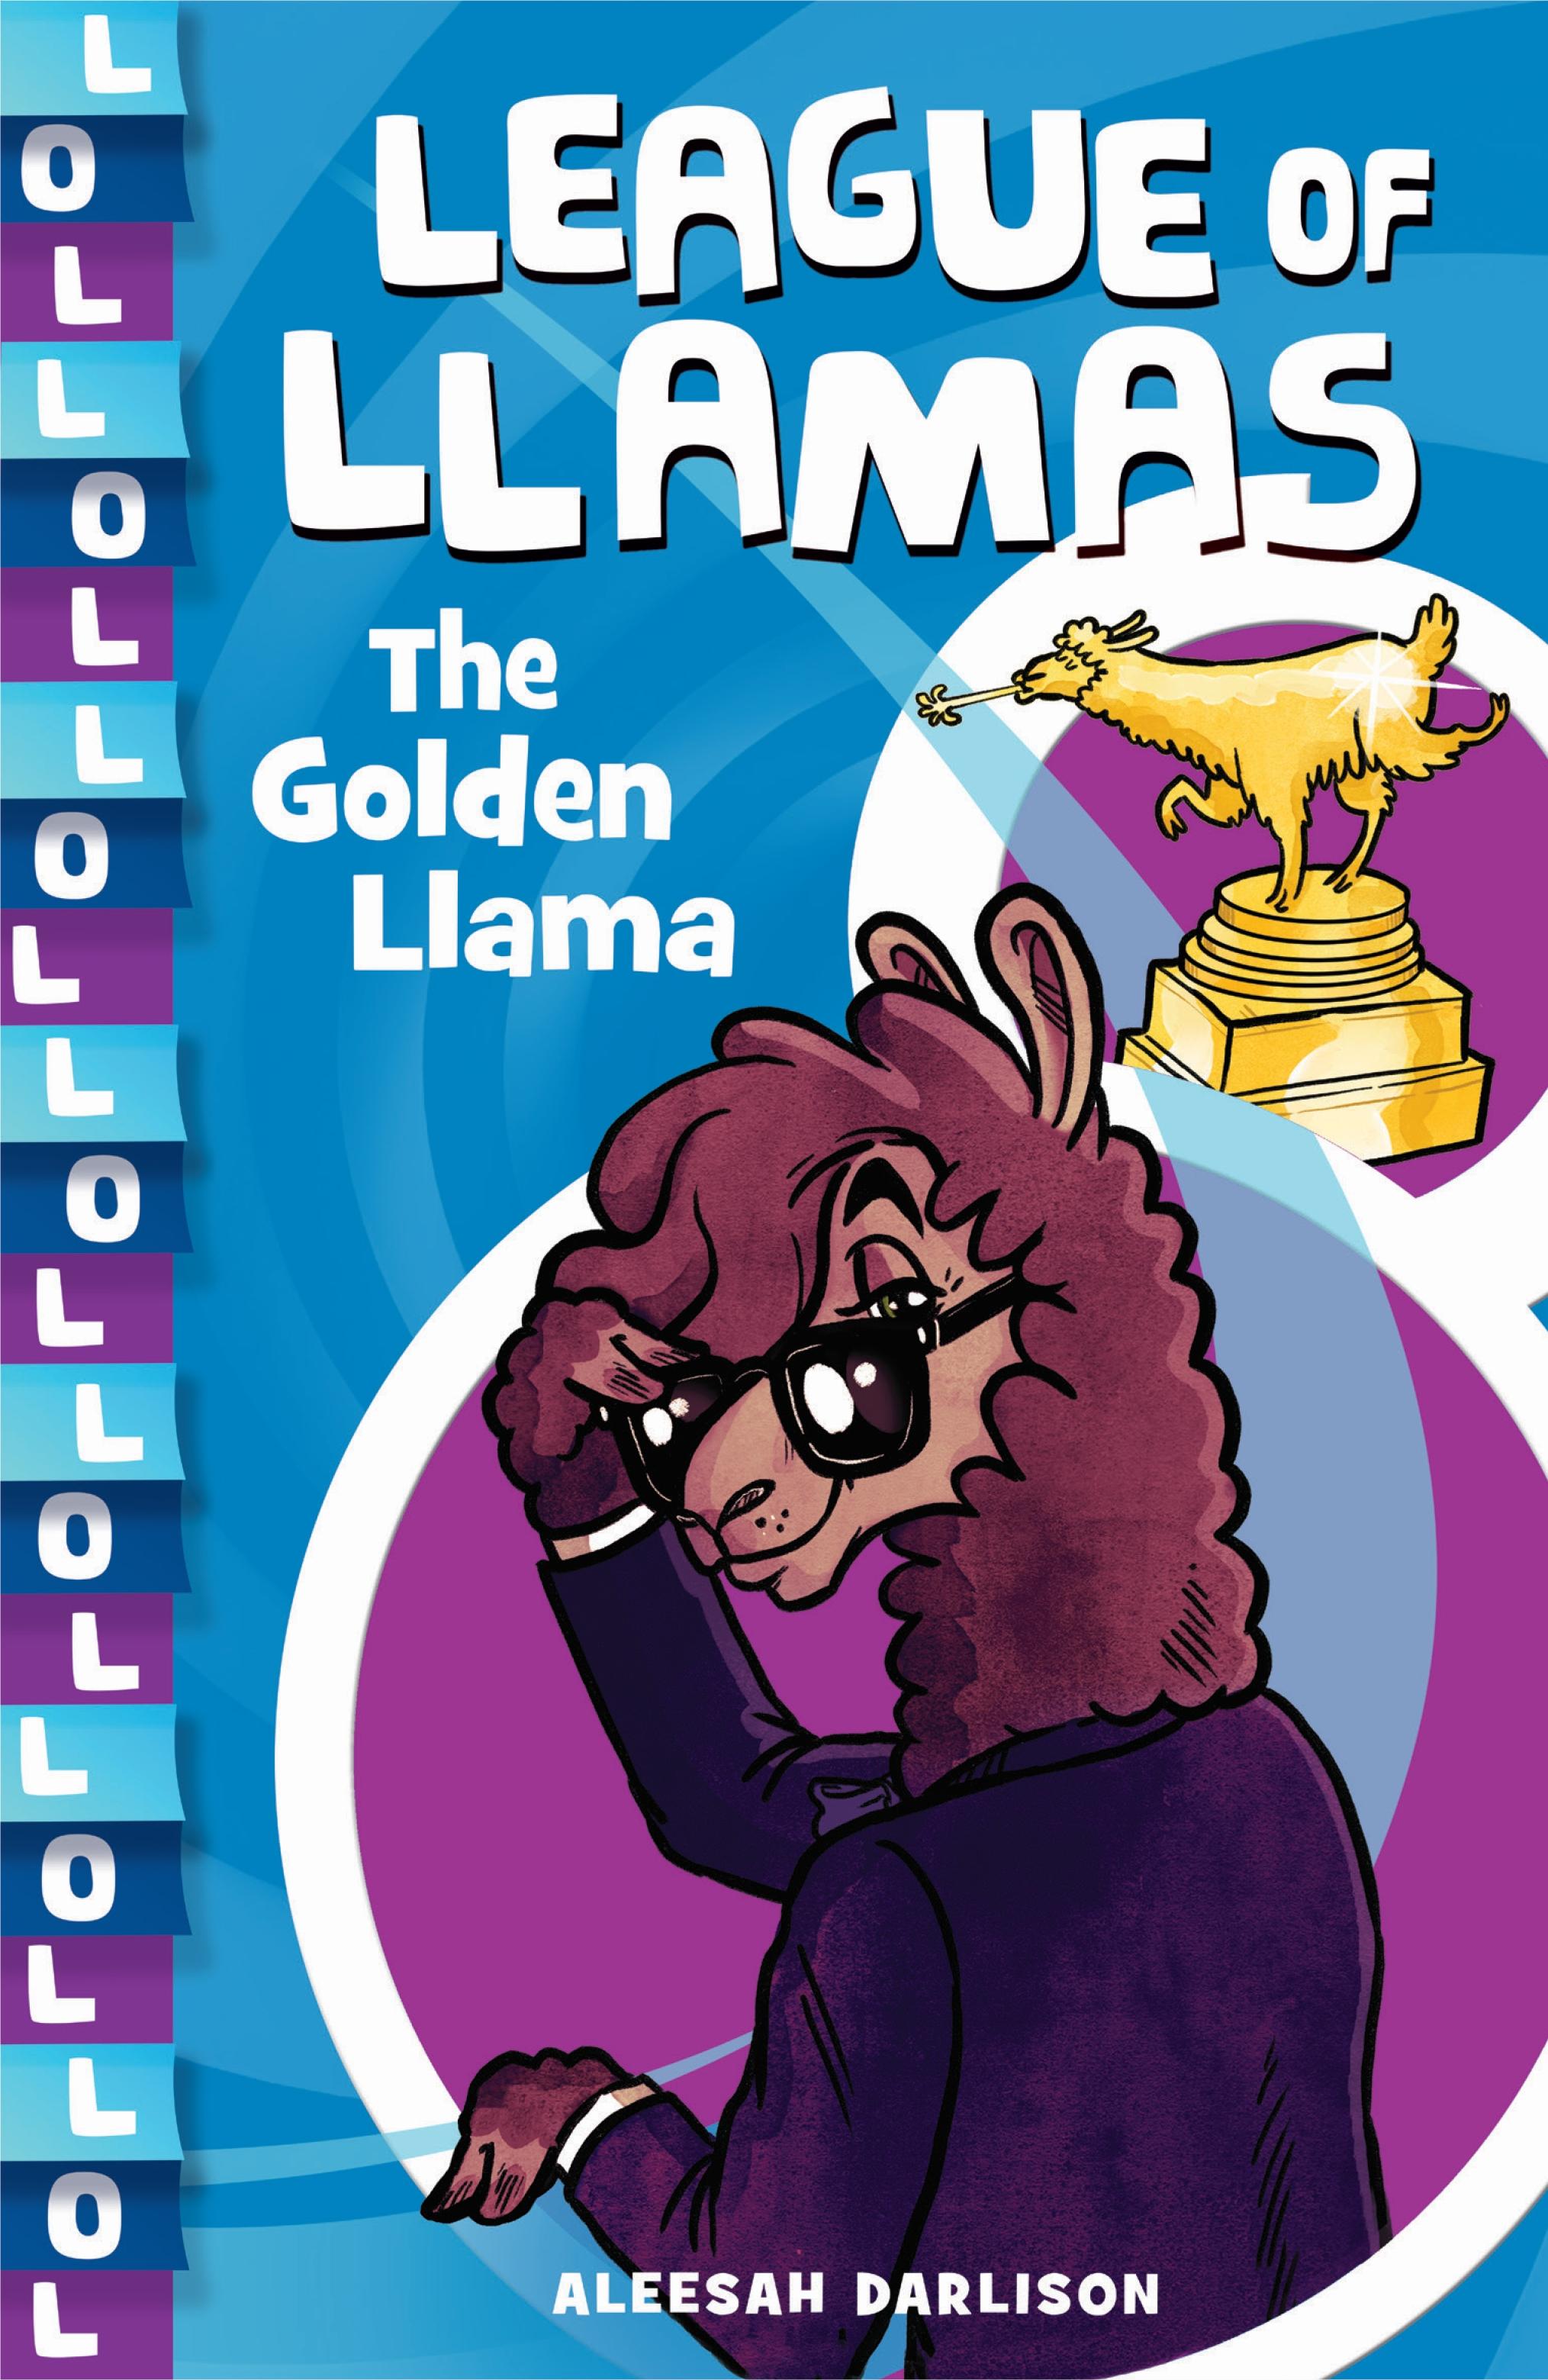 [PDF] [EPUB] The Golden Llama (League of Llamas, #1) Download by Aleesah Darlison